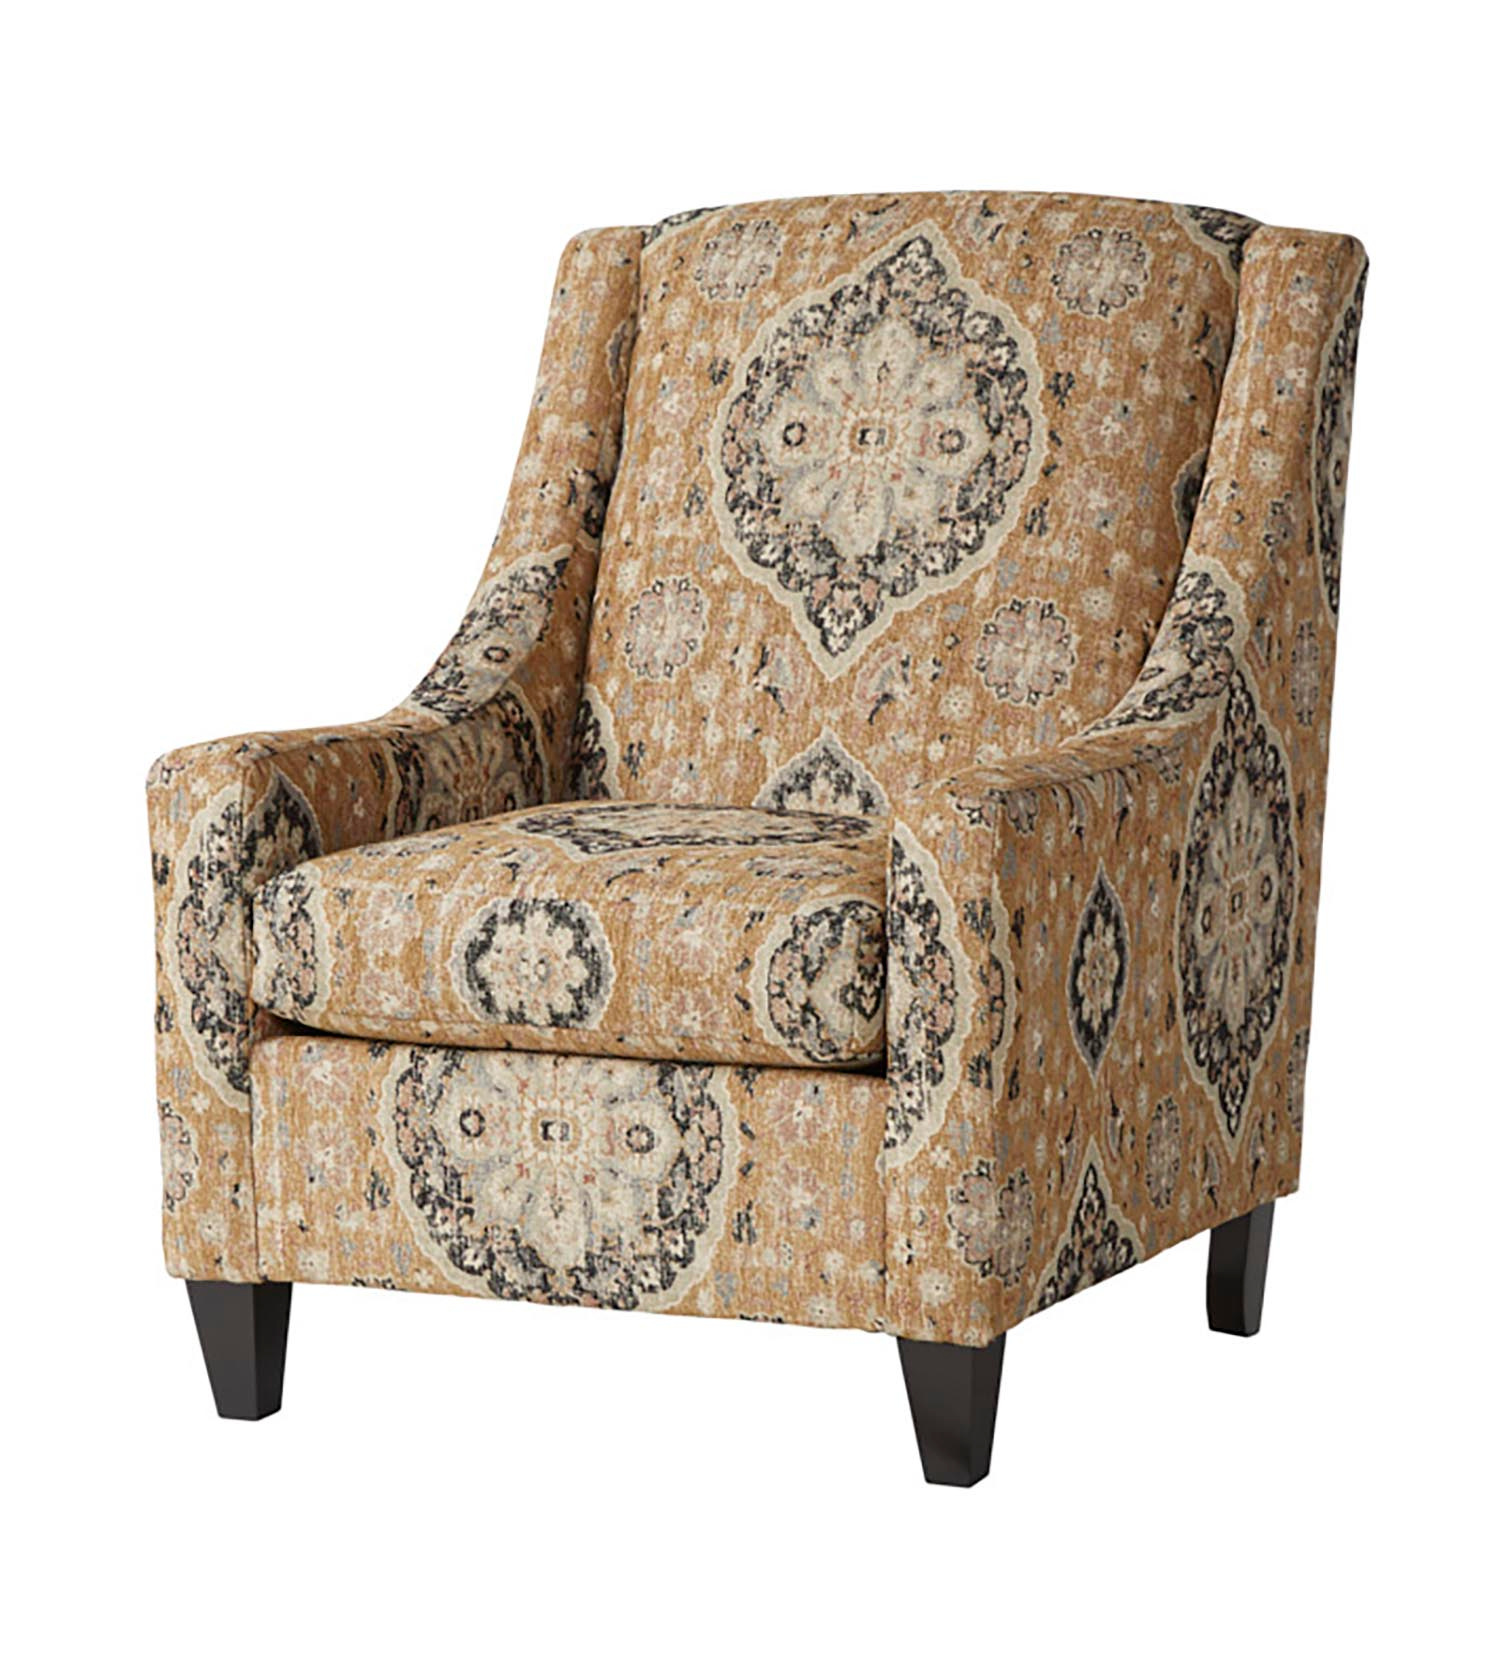 1575TAAN Serta Accent Chair